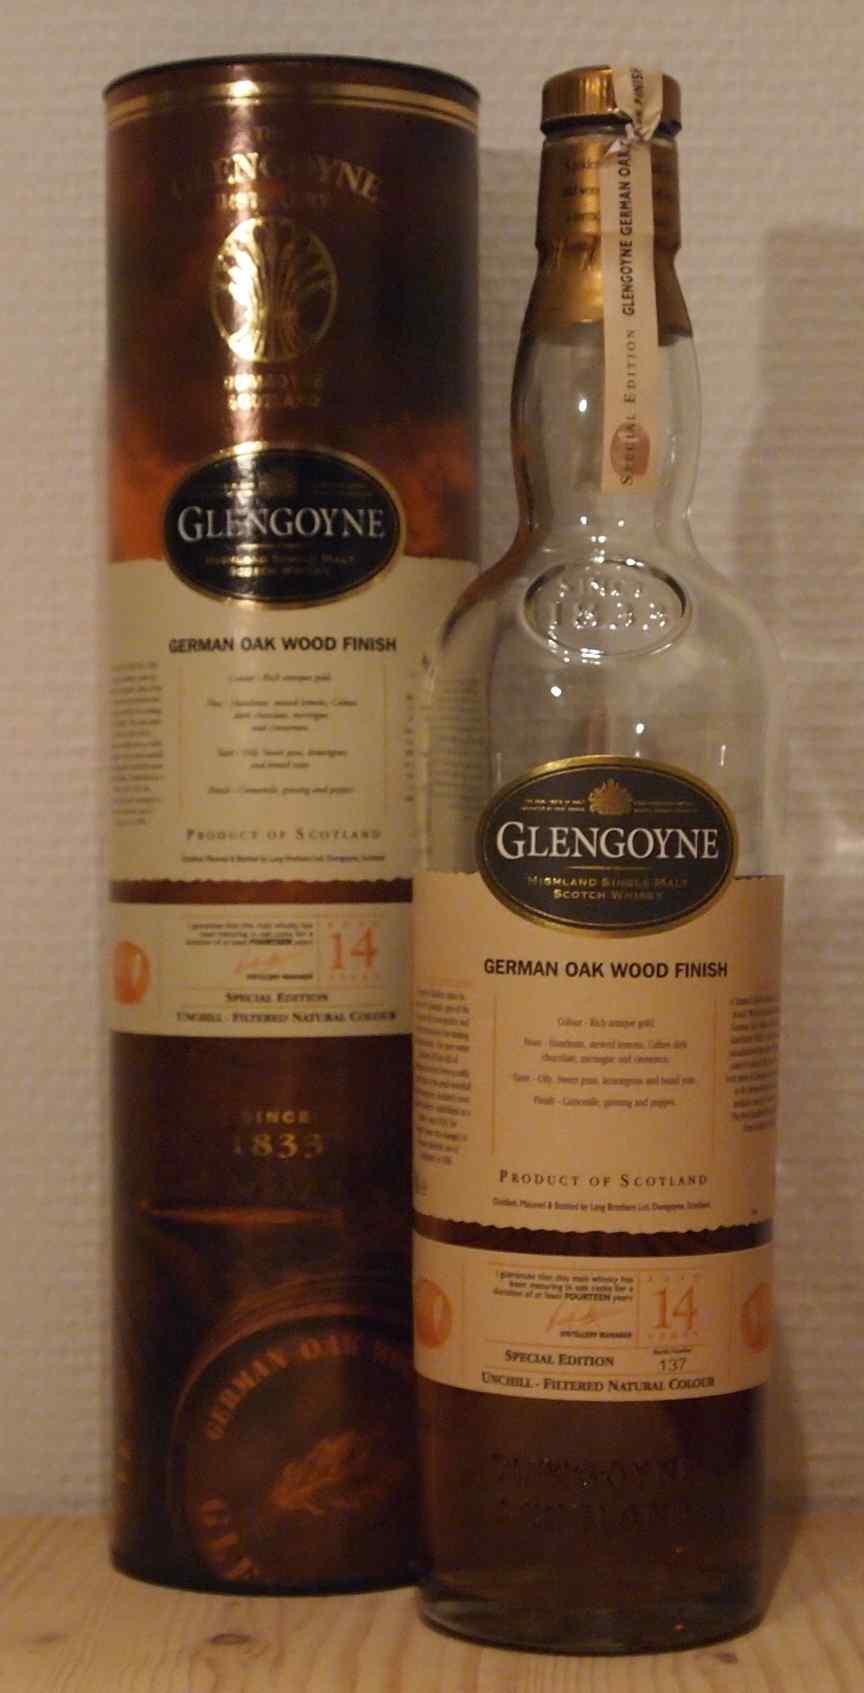 Single Malt Whisky Glengoyne 14yo German Oak